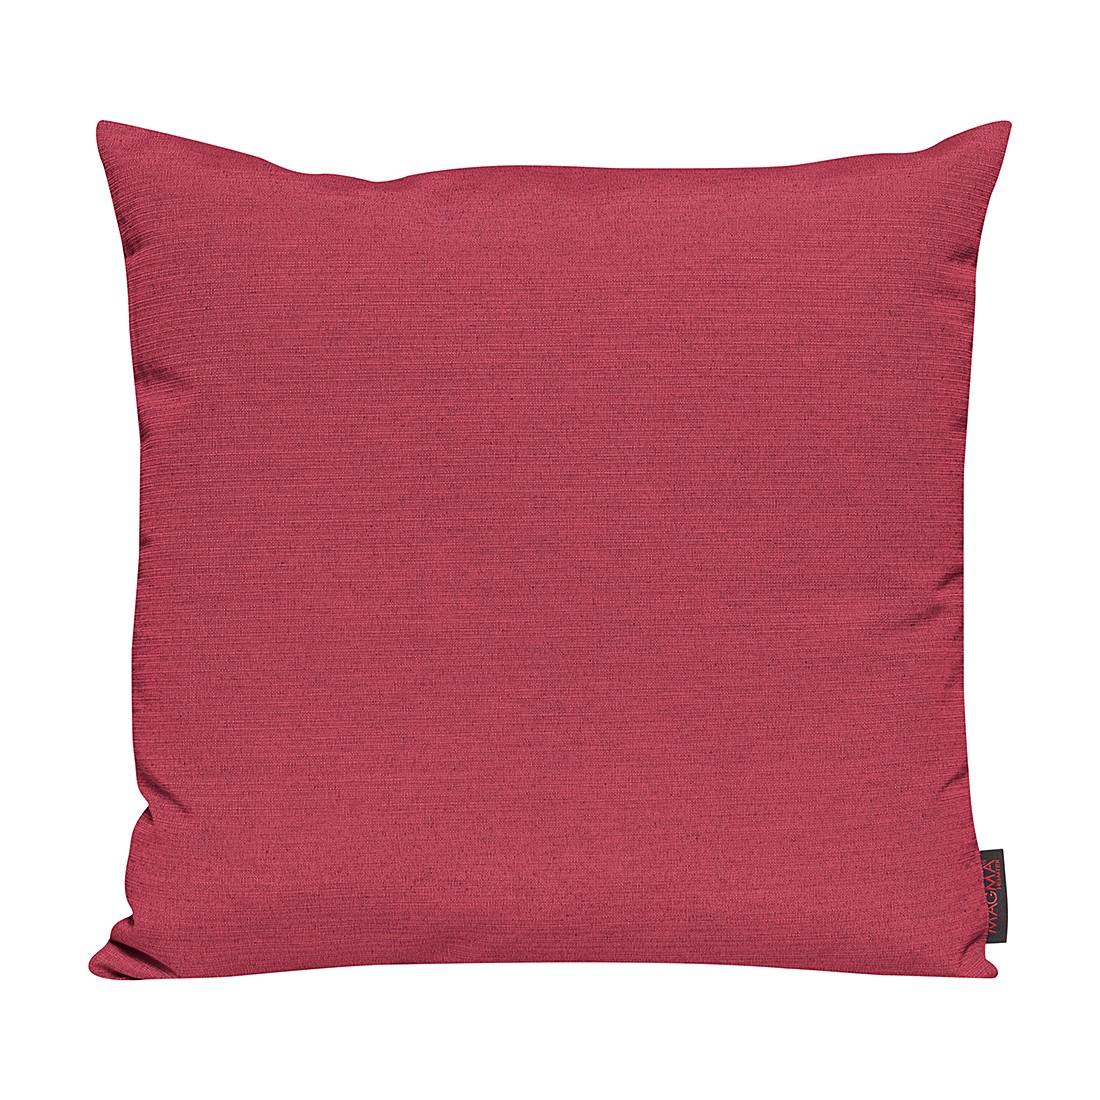 Kussensloop Franca - roze - 40x40cm, twentyfour